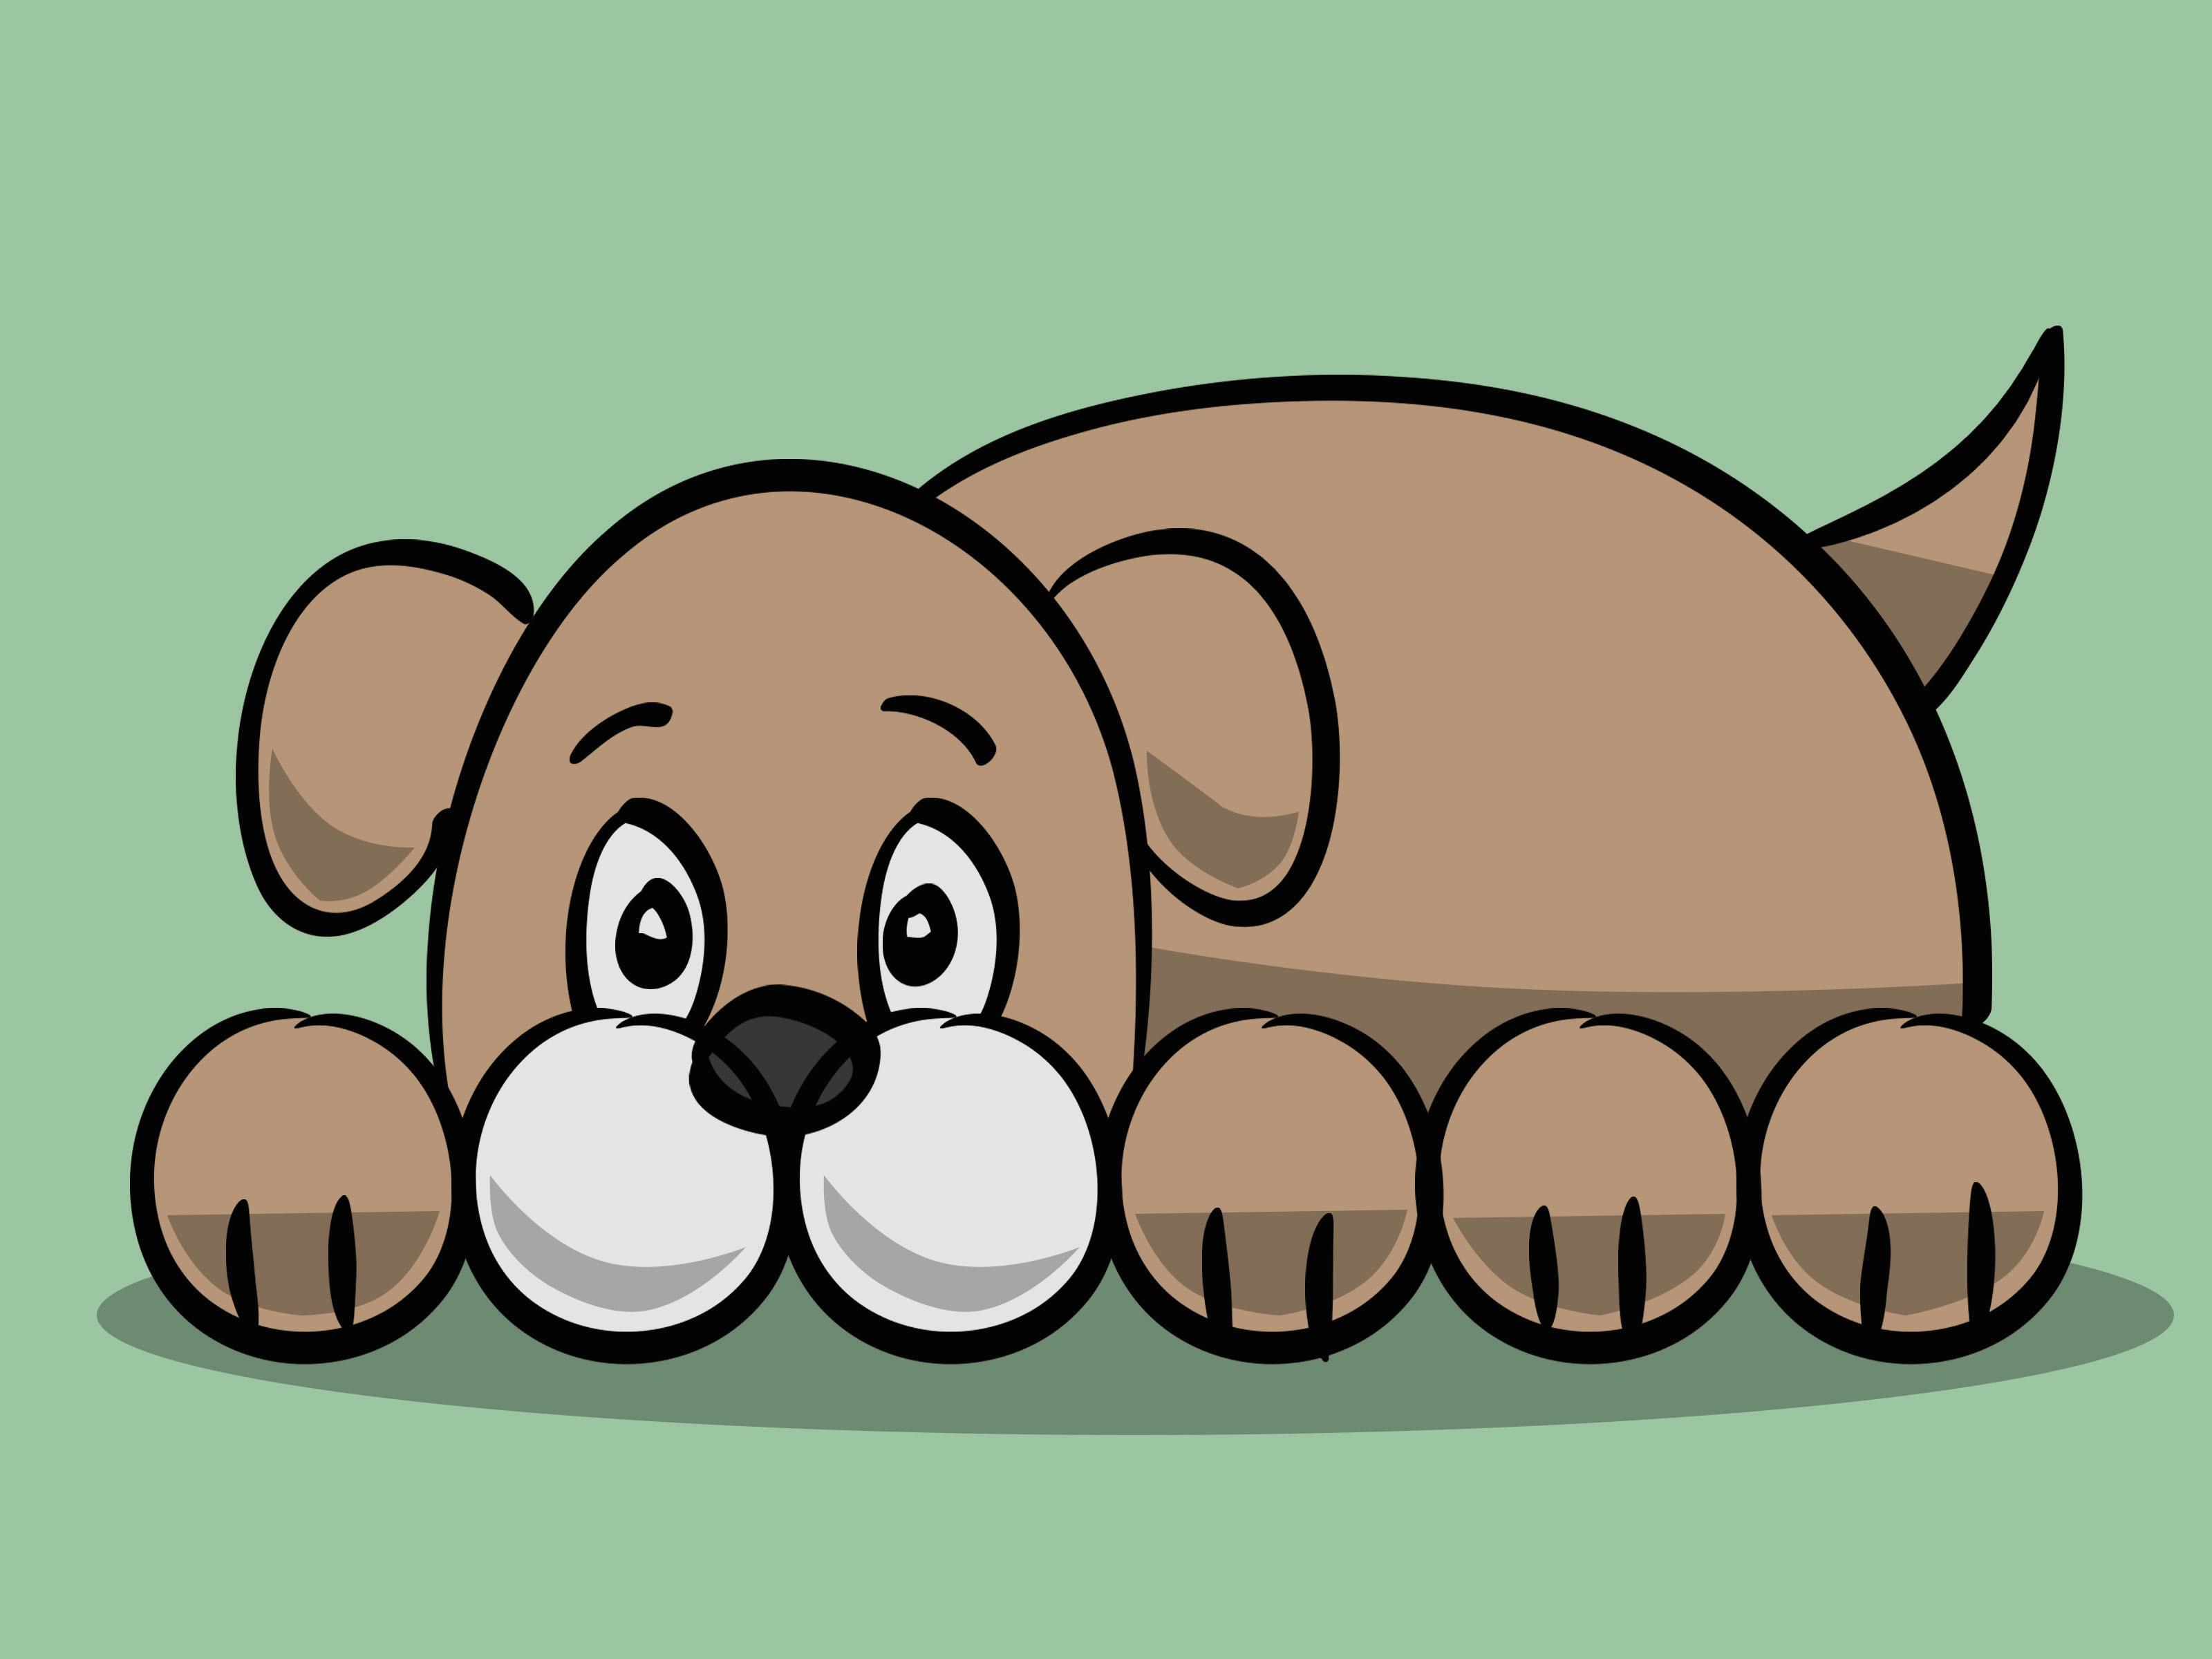 draw a simple cartoon dog step 11 version 3 jpg